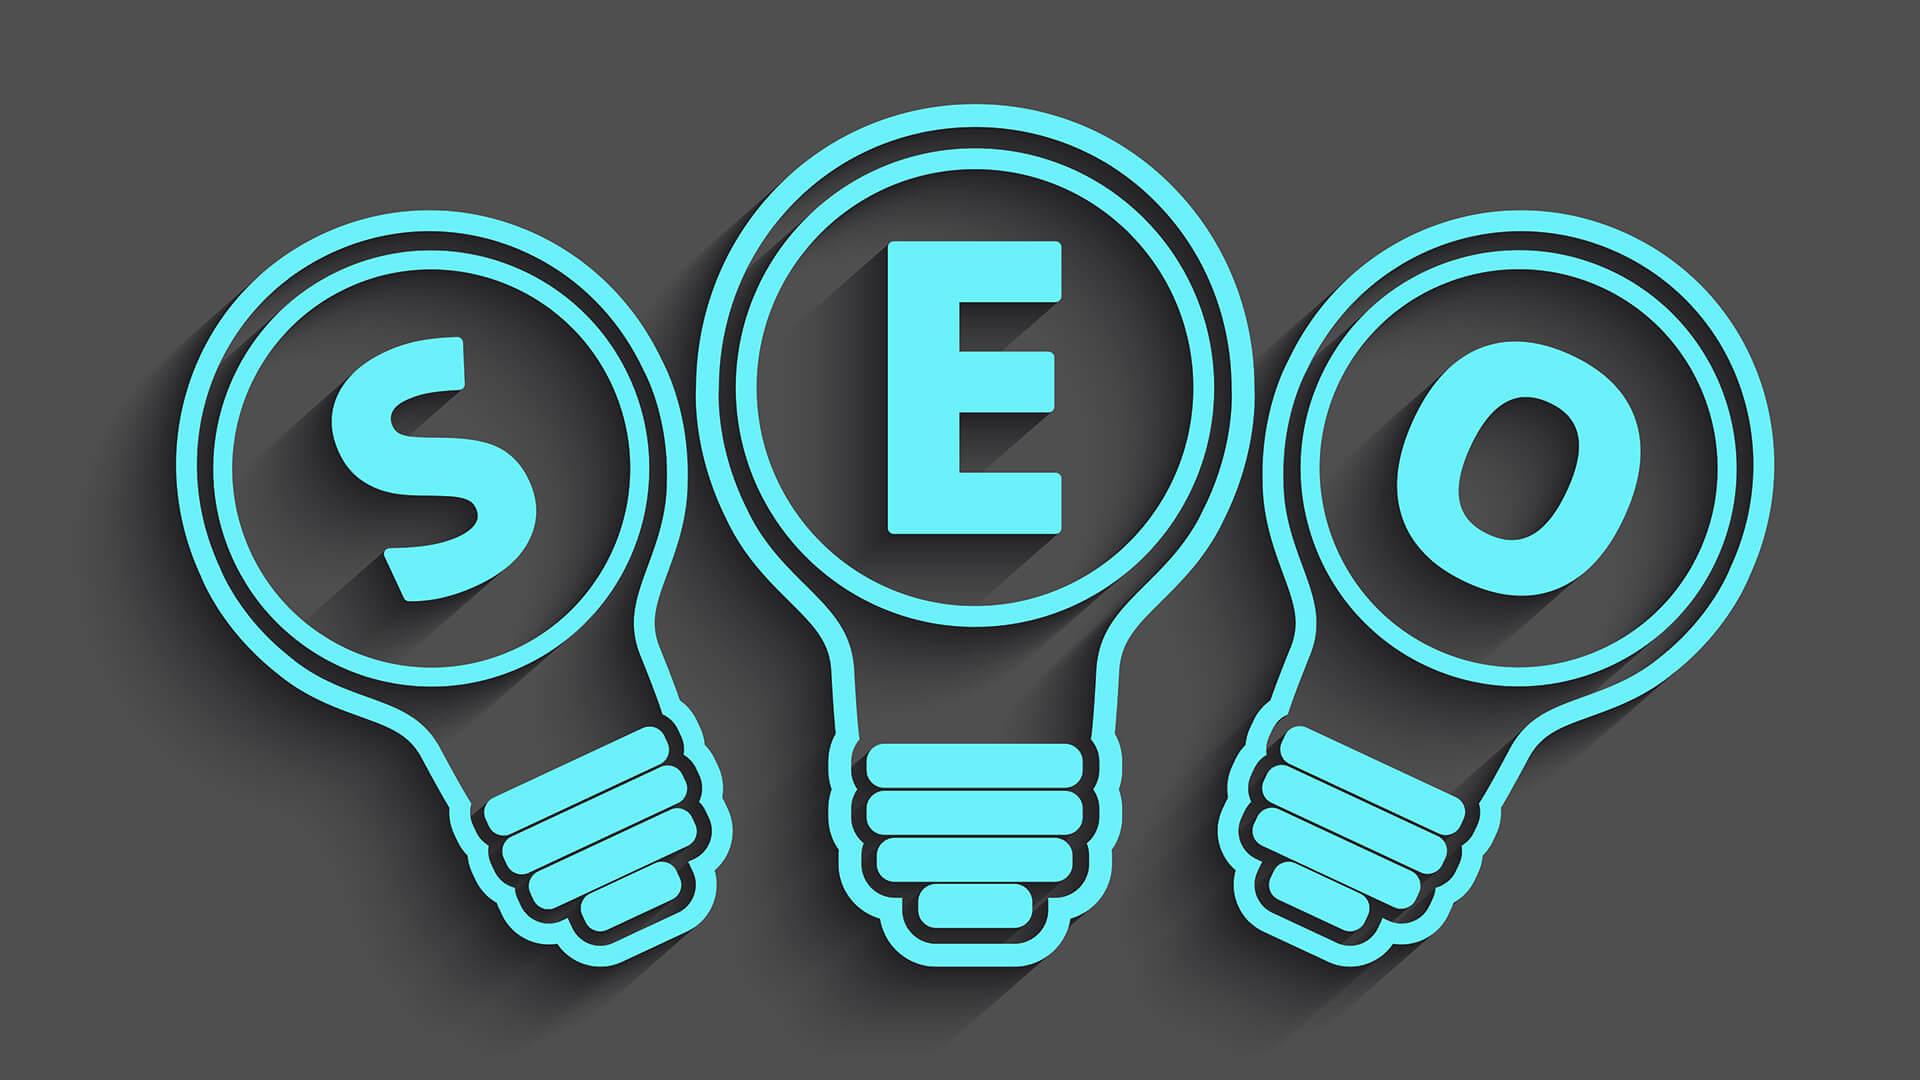 Publish 2 Guest Posts on Education Niche Backlink Building SEO Content Marketing